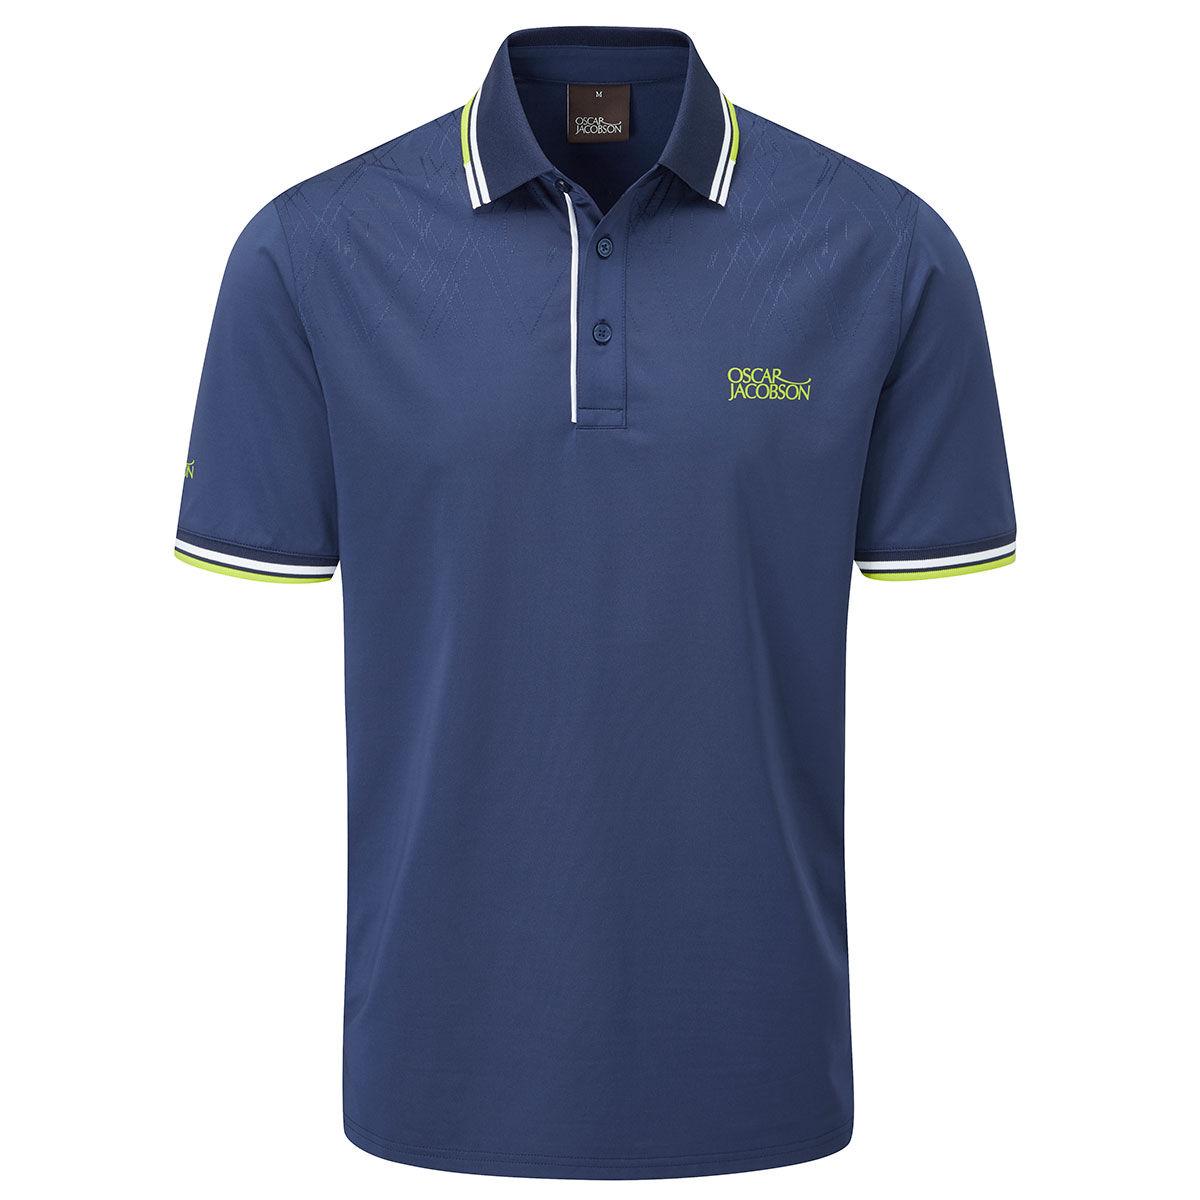 Oscar Jacobson Buxton Golf Polo Shirt, Mens, Navy, Large | American Golf